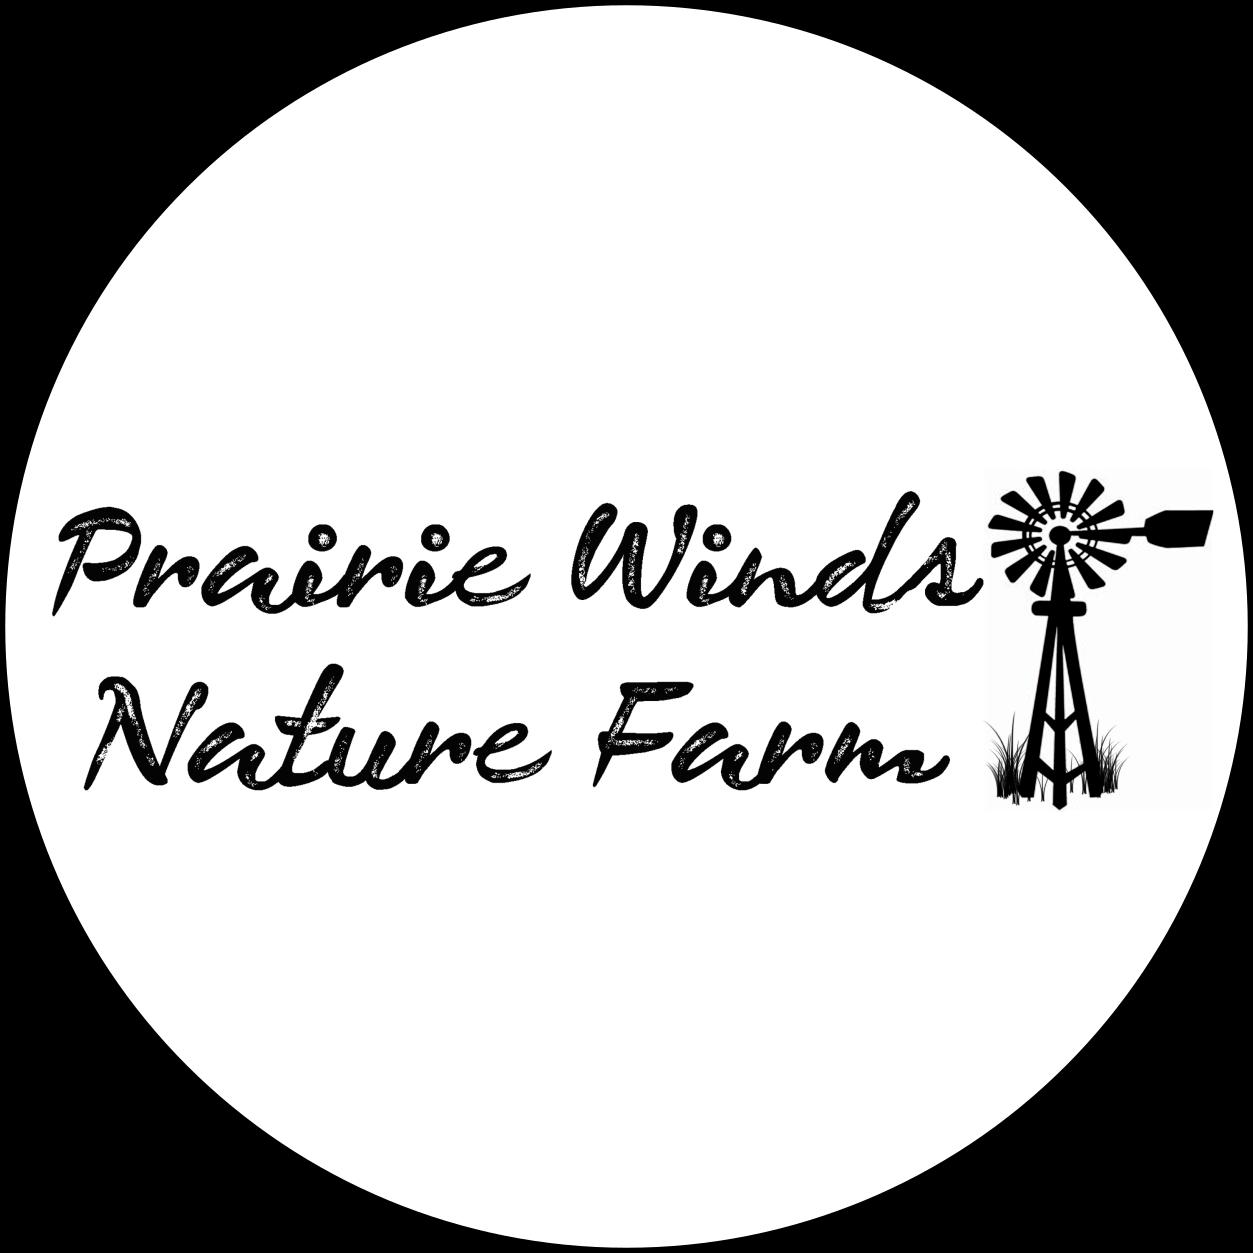 Prairie Winds Farm - Lower Elementary(Grades 1 - 3)